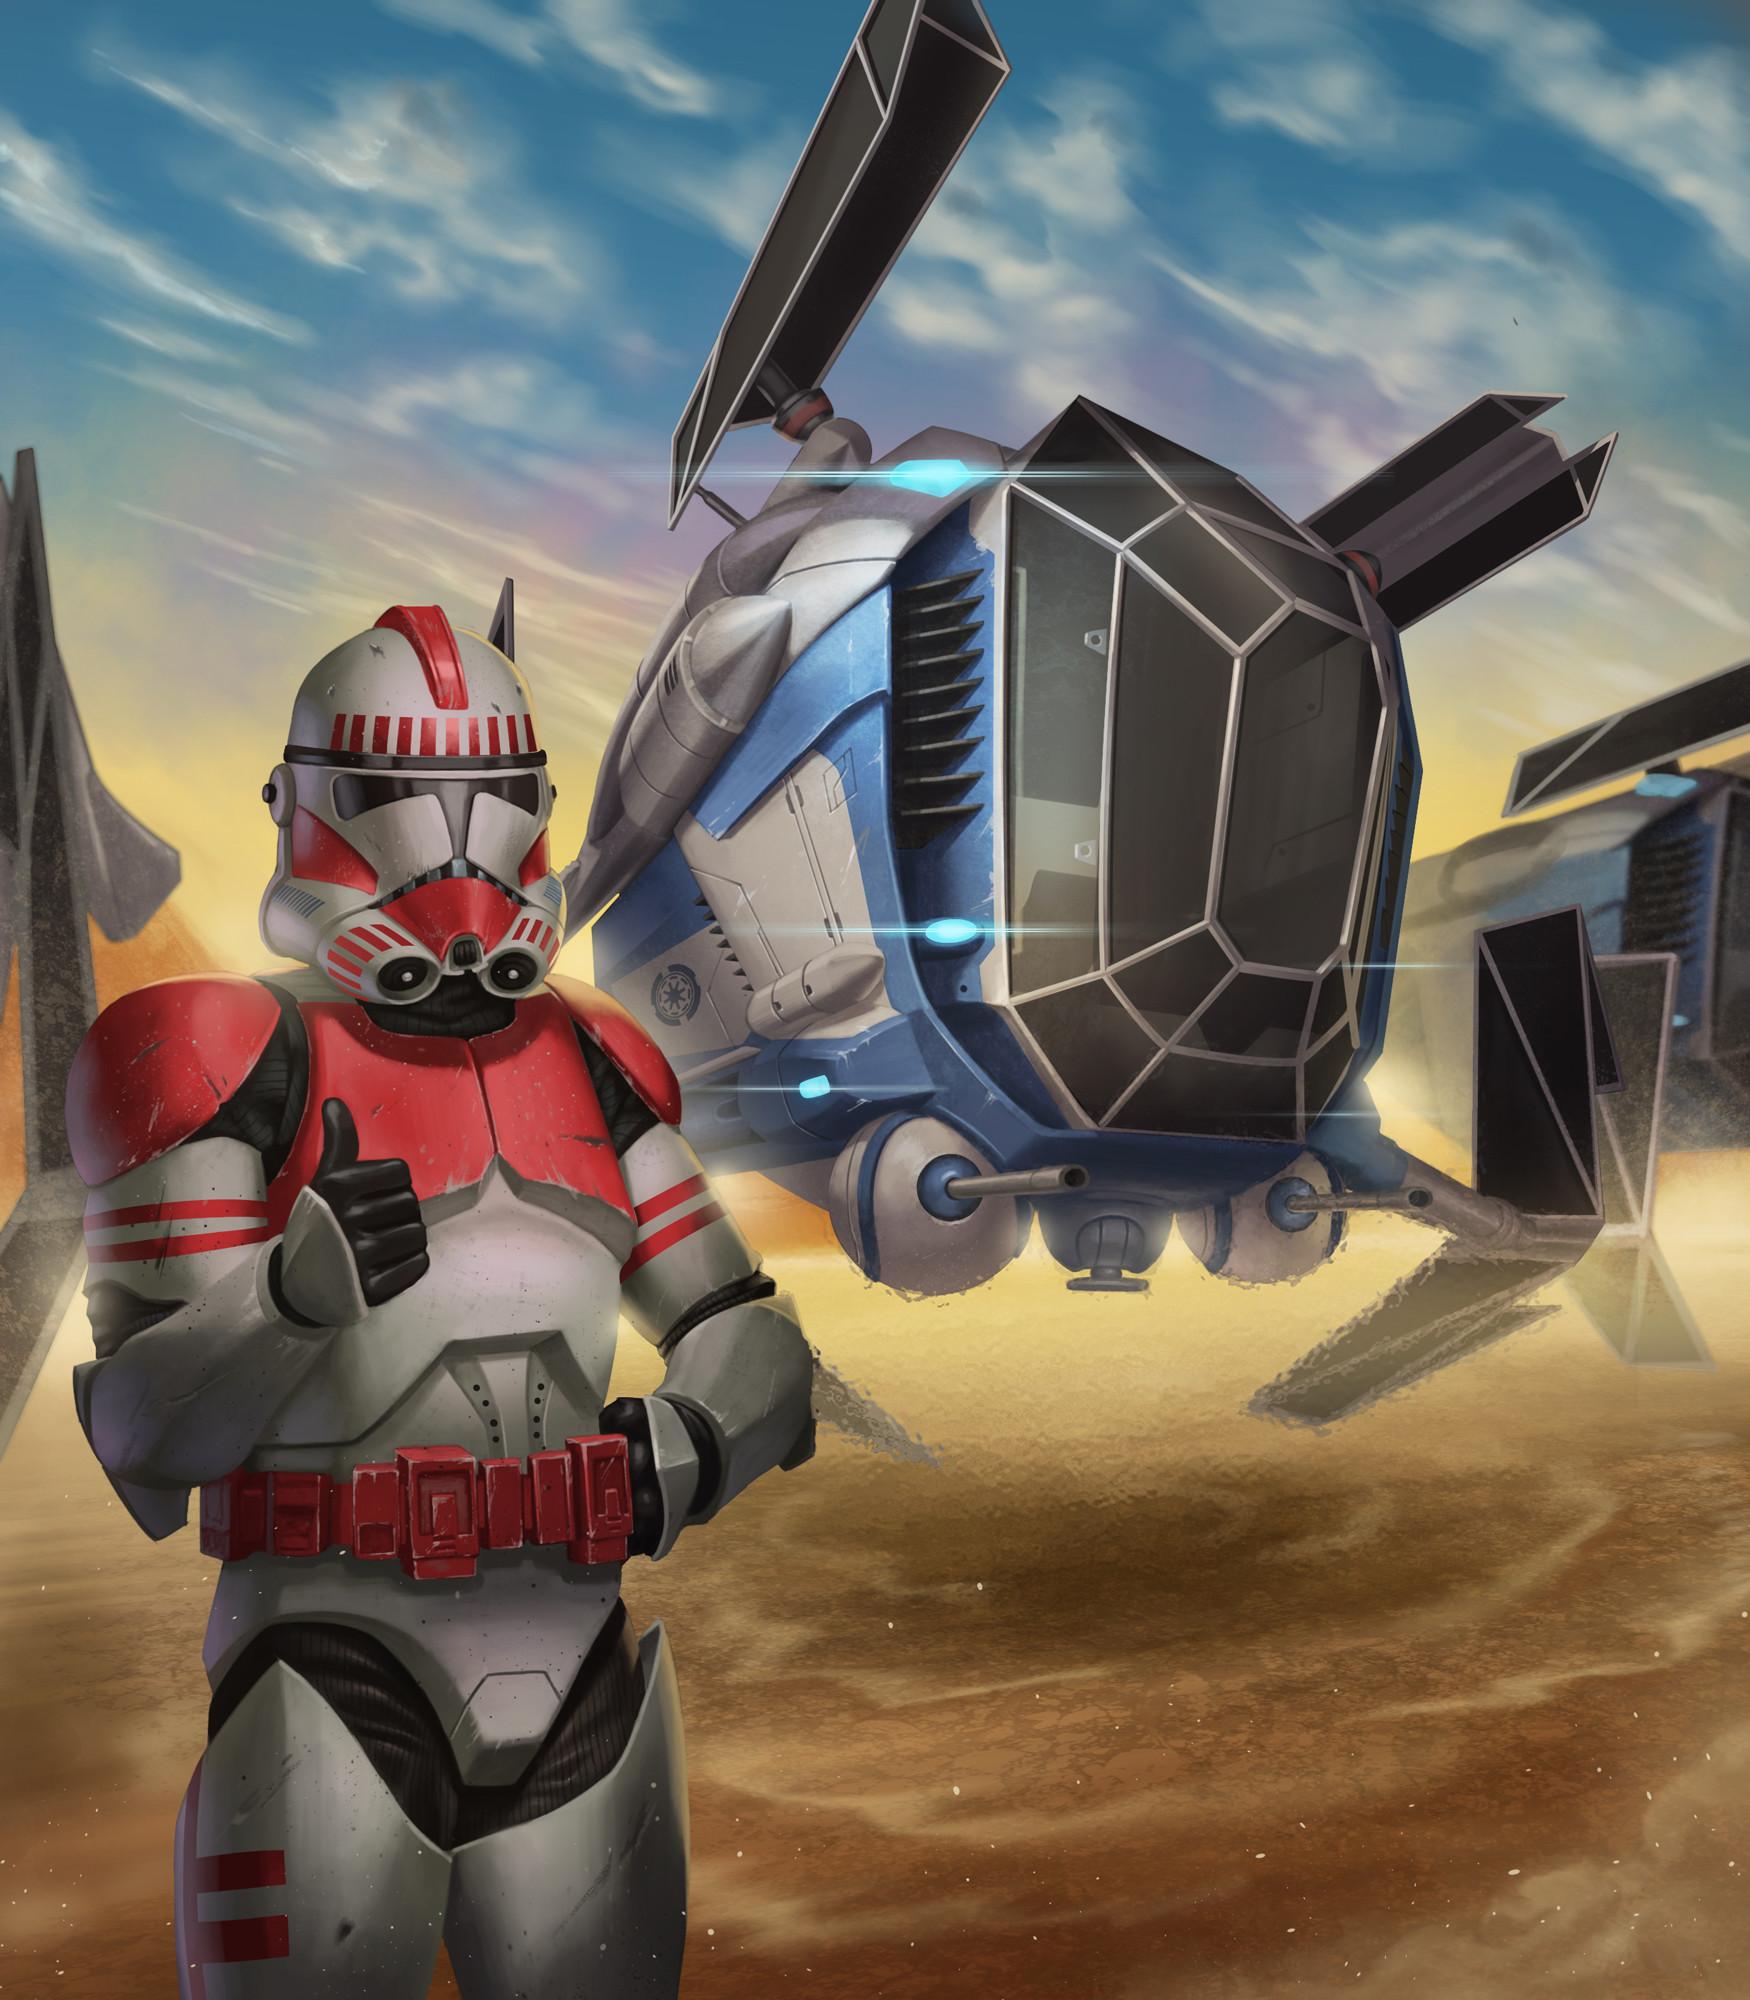 Brian Fajardo Police Gunship Star Wars Scum And Villainy